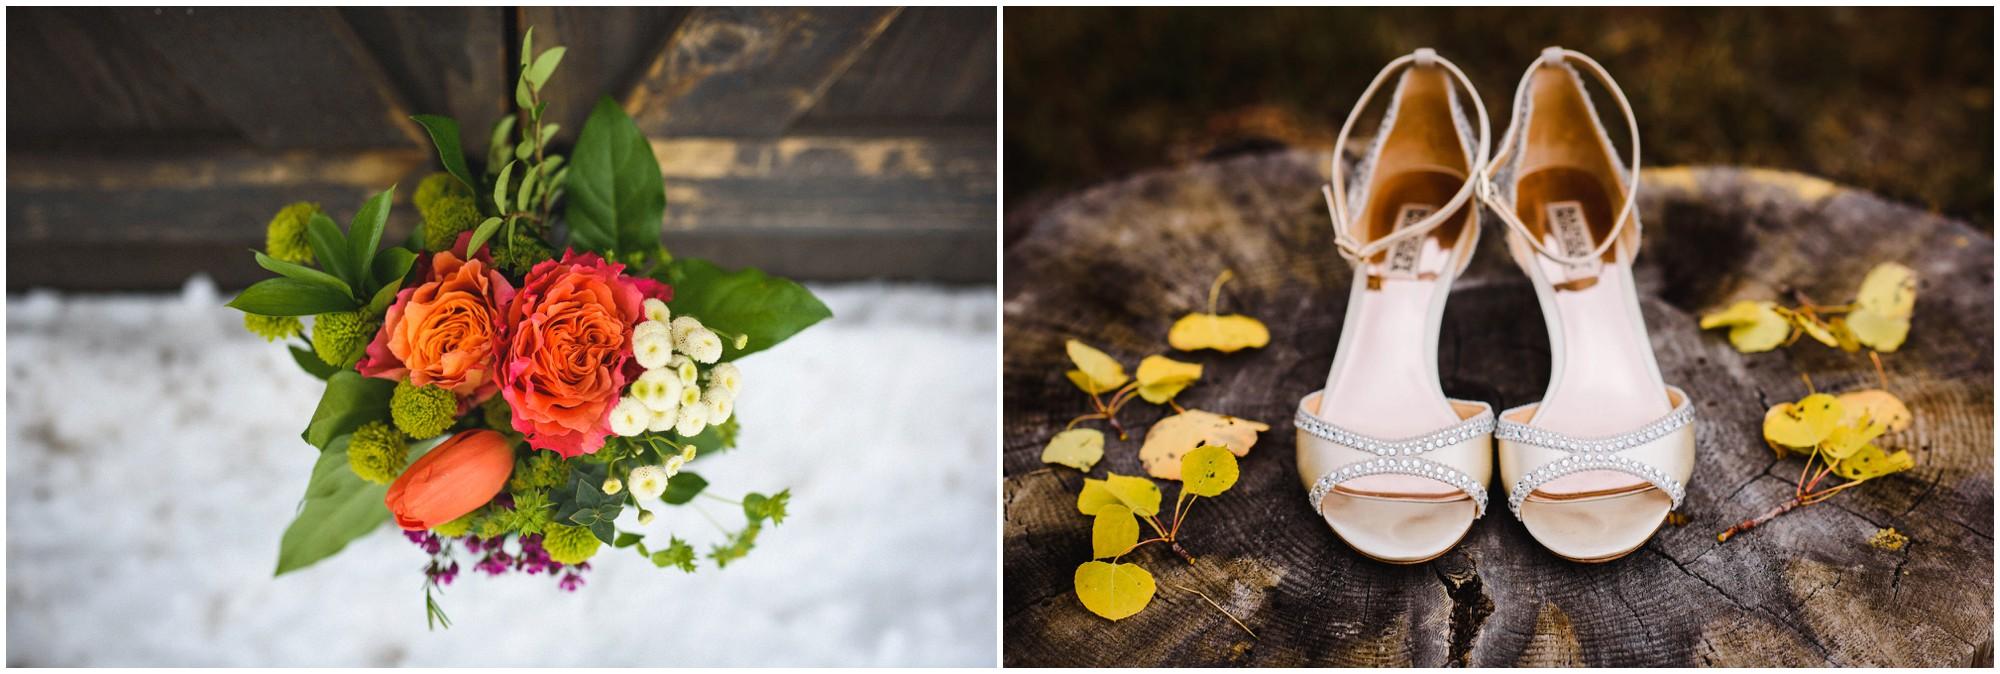 09-evergreen-mountain-winter-wedding-photography.jpg